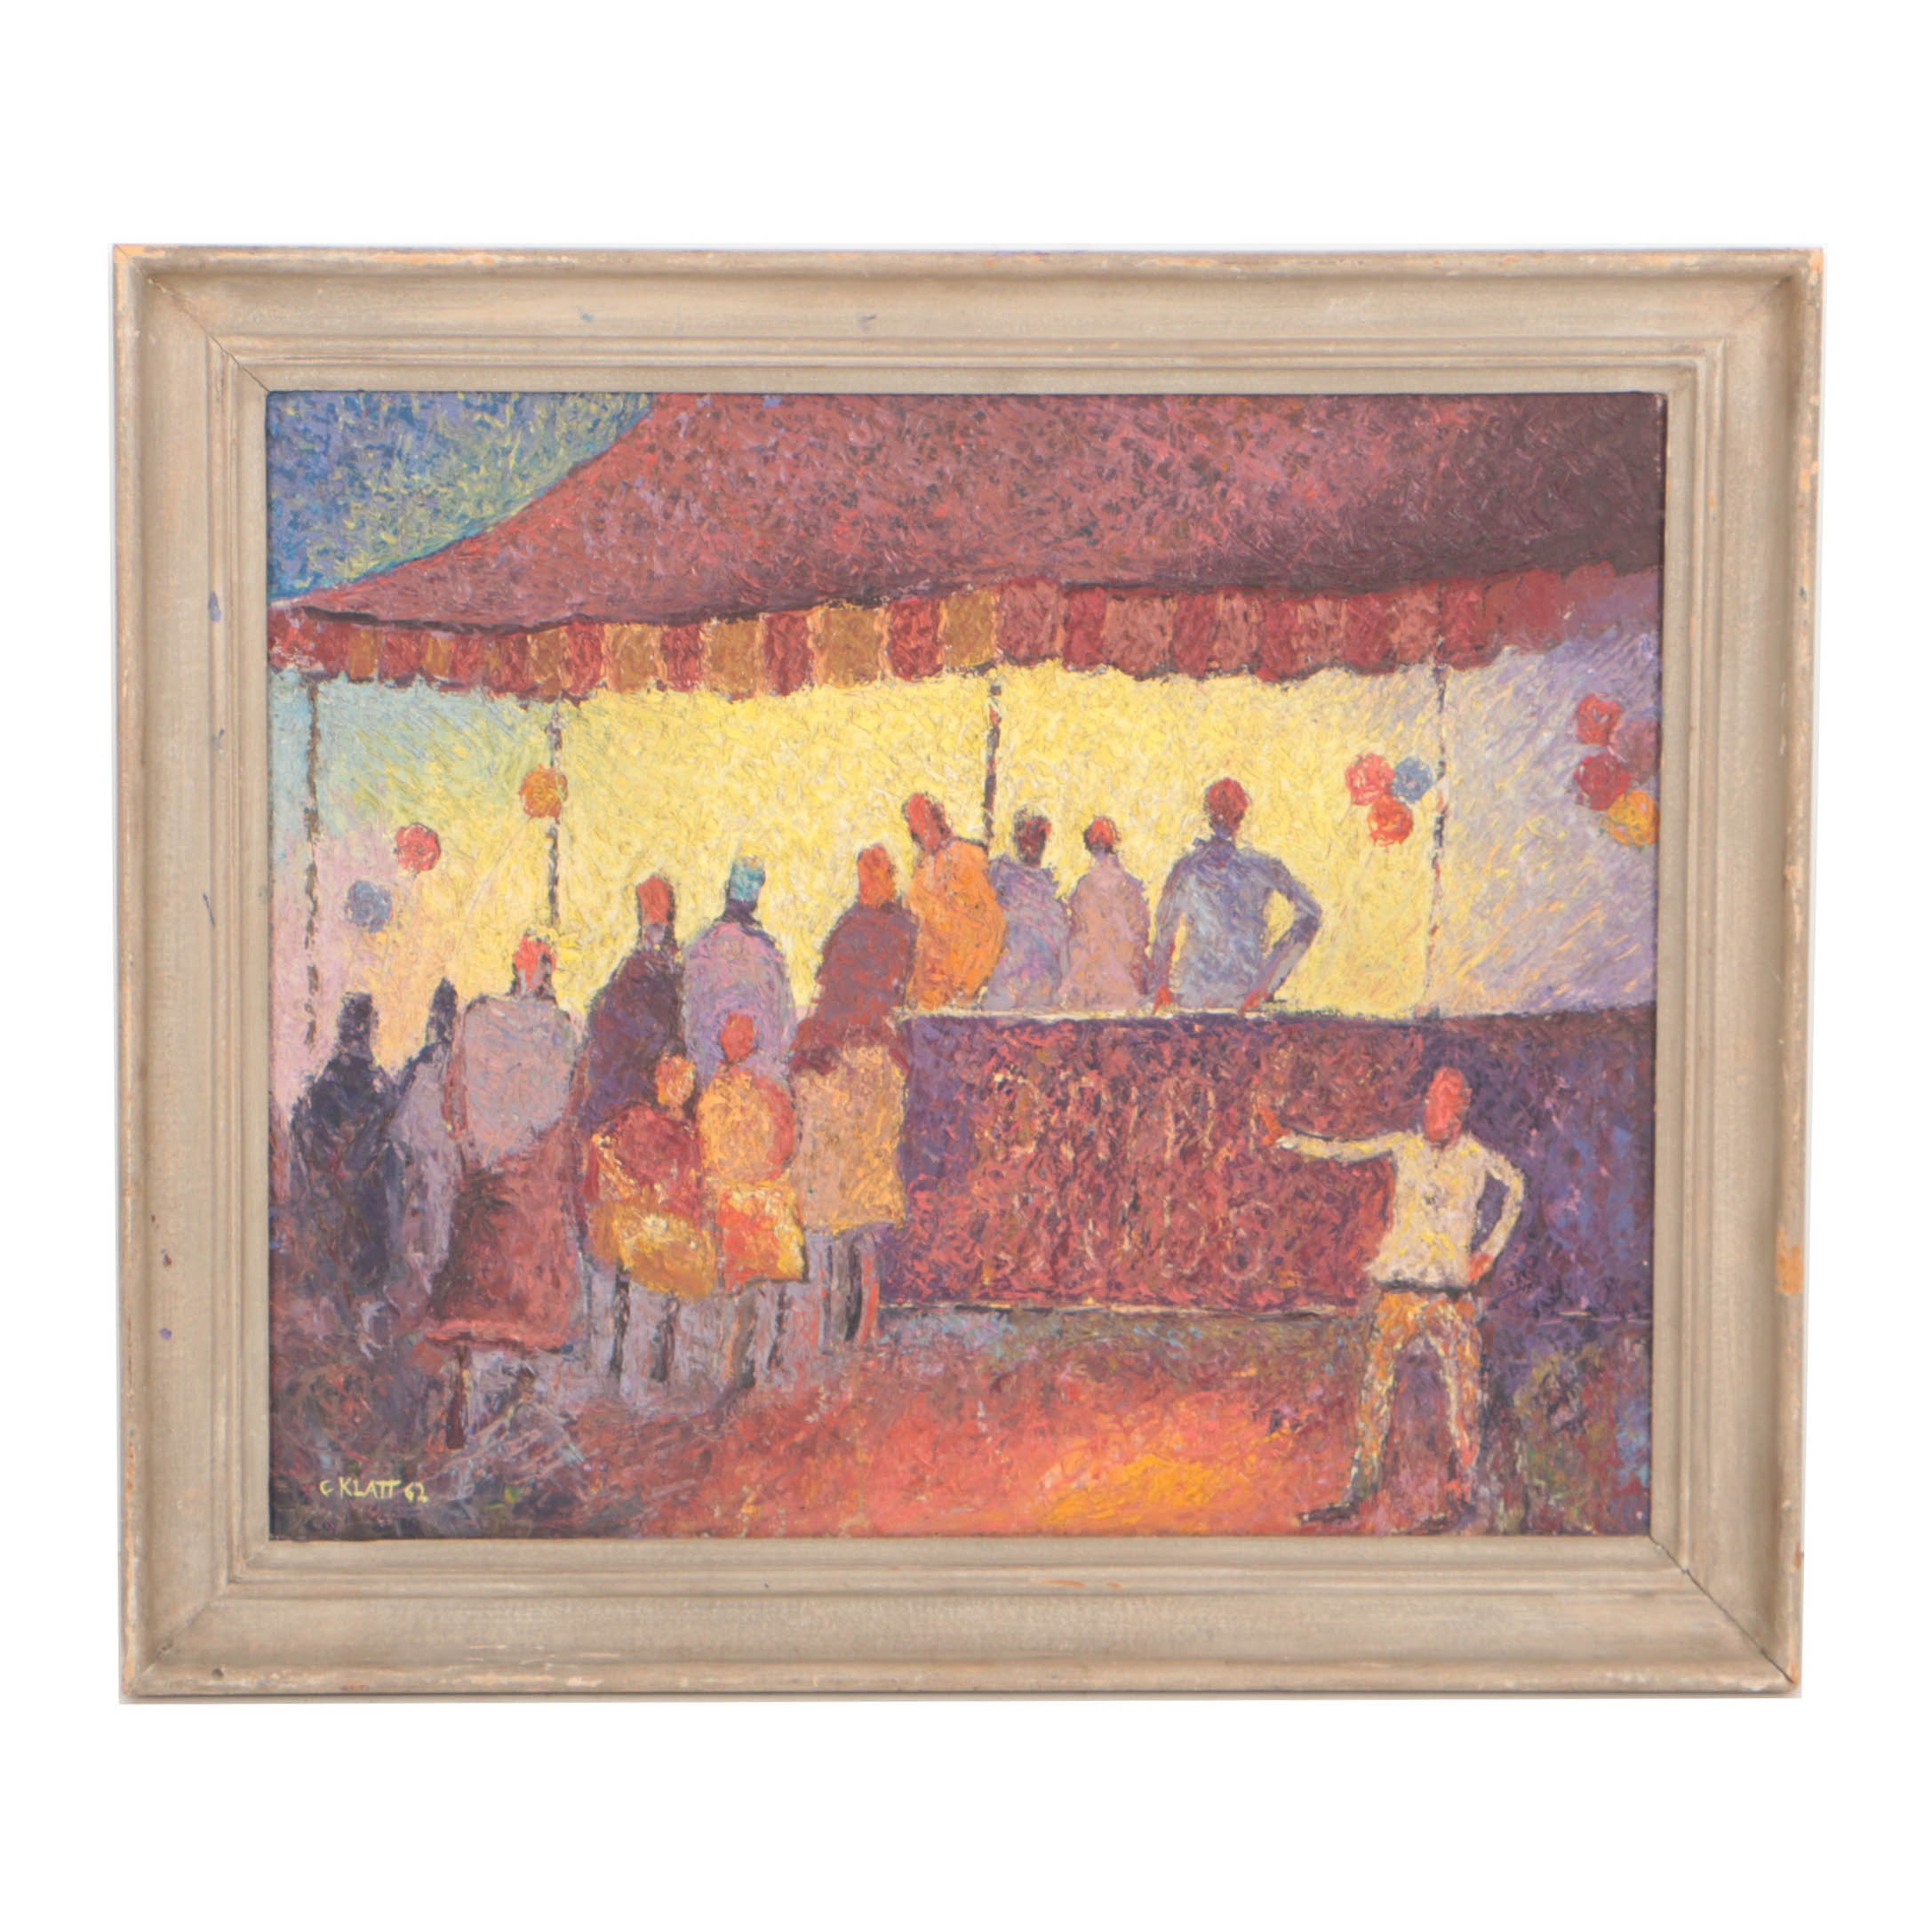 "Clarence Klatt 1962 Oil Painting ""At the Fair"""